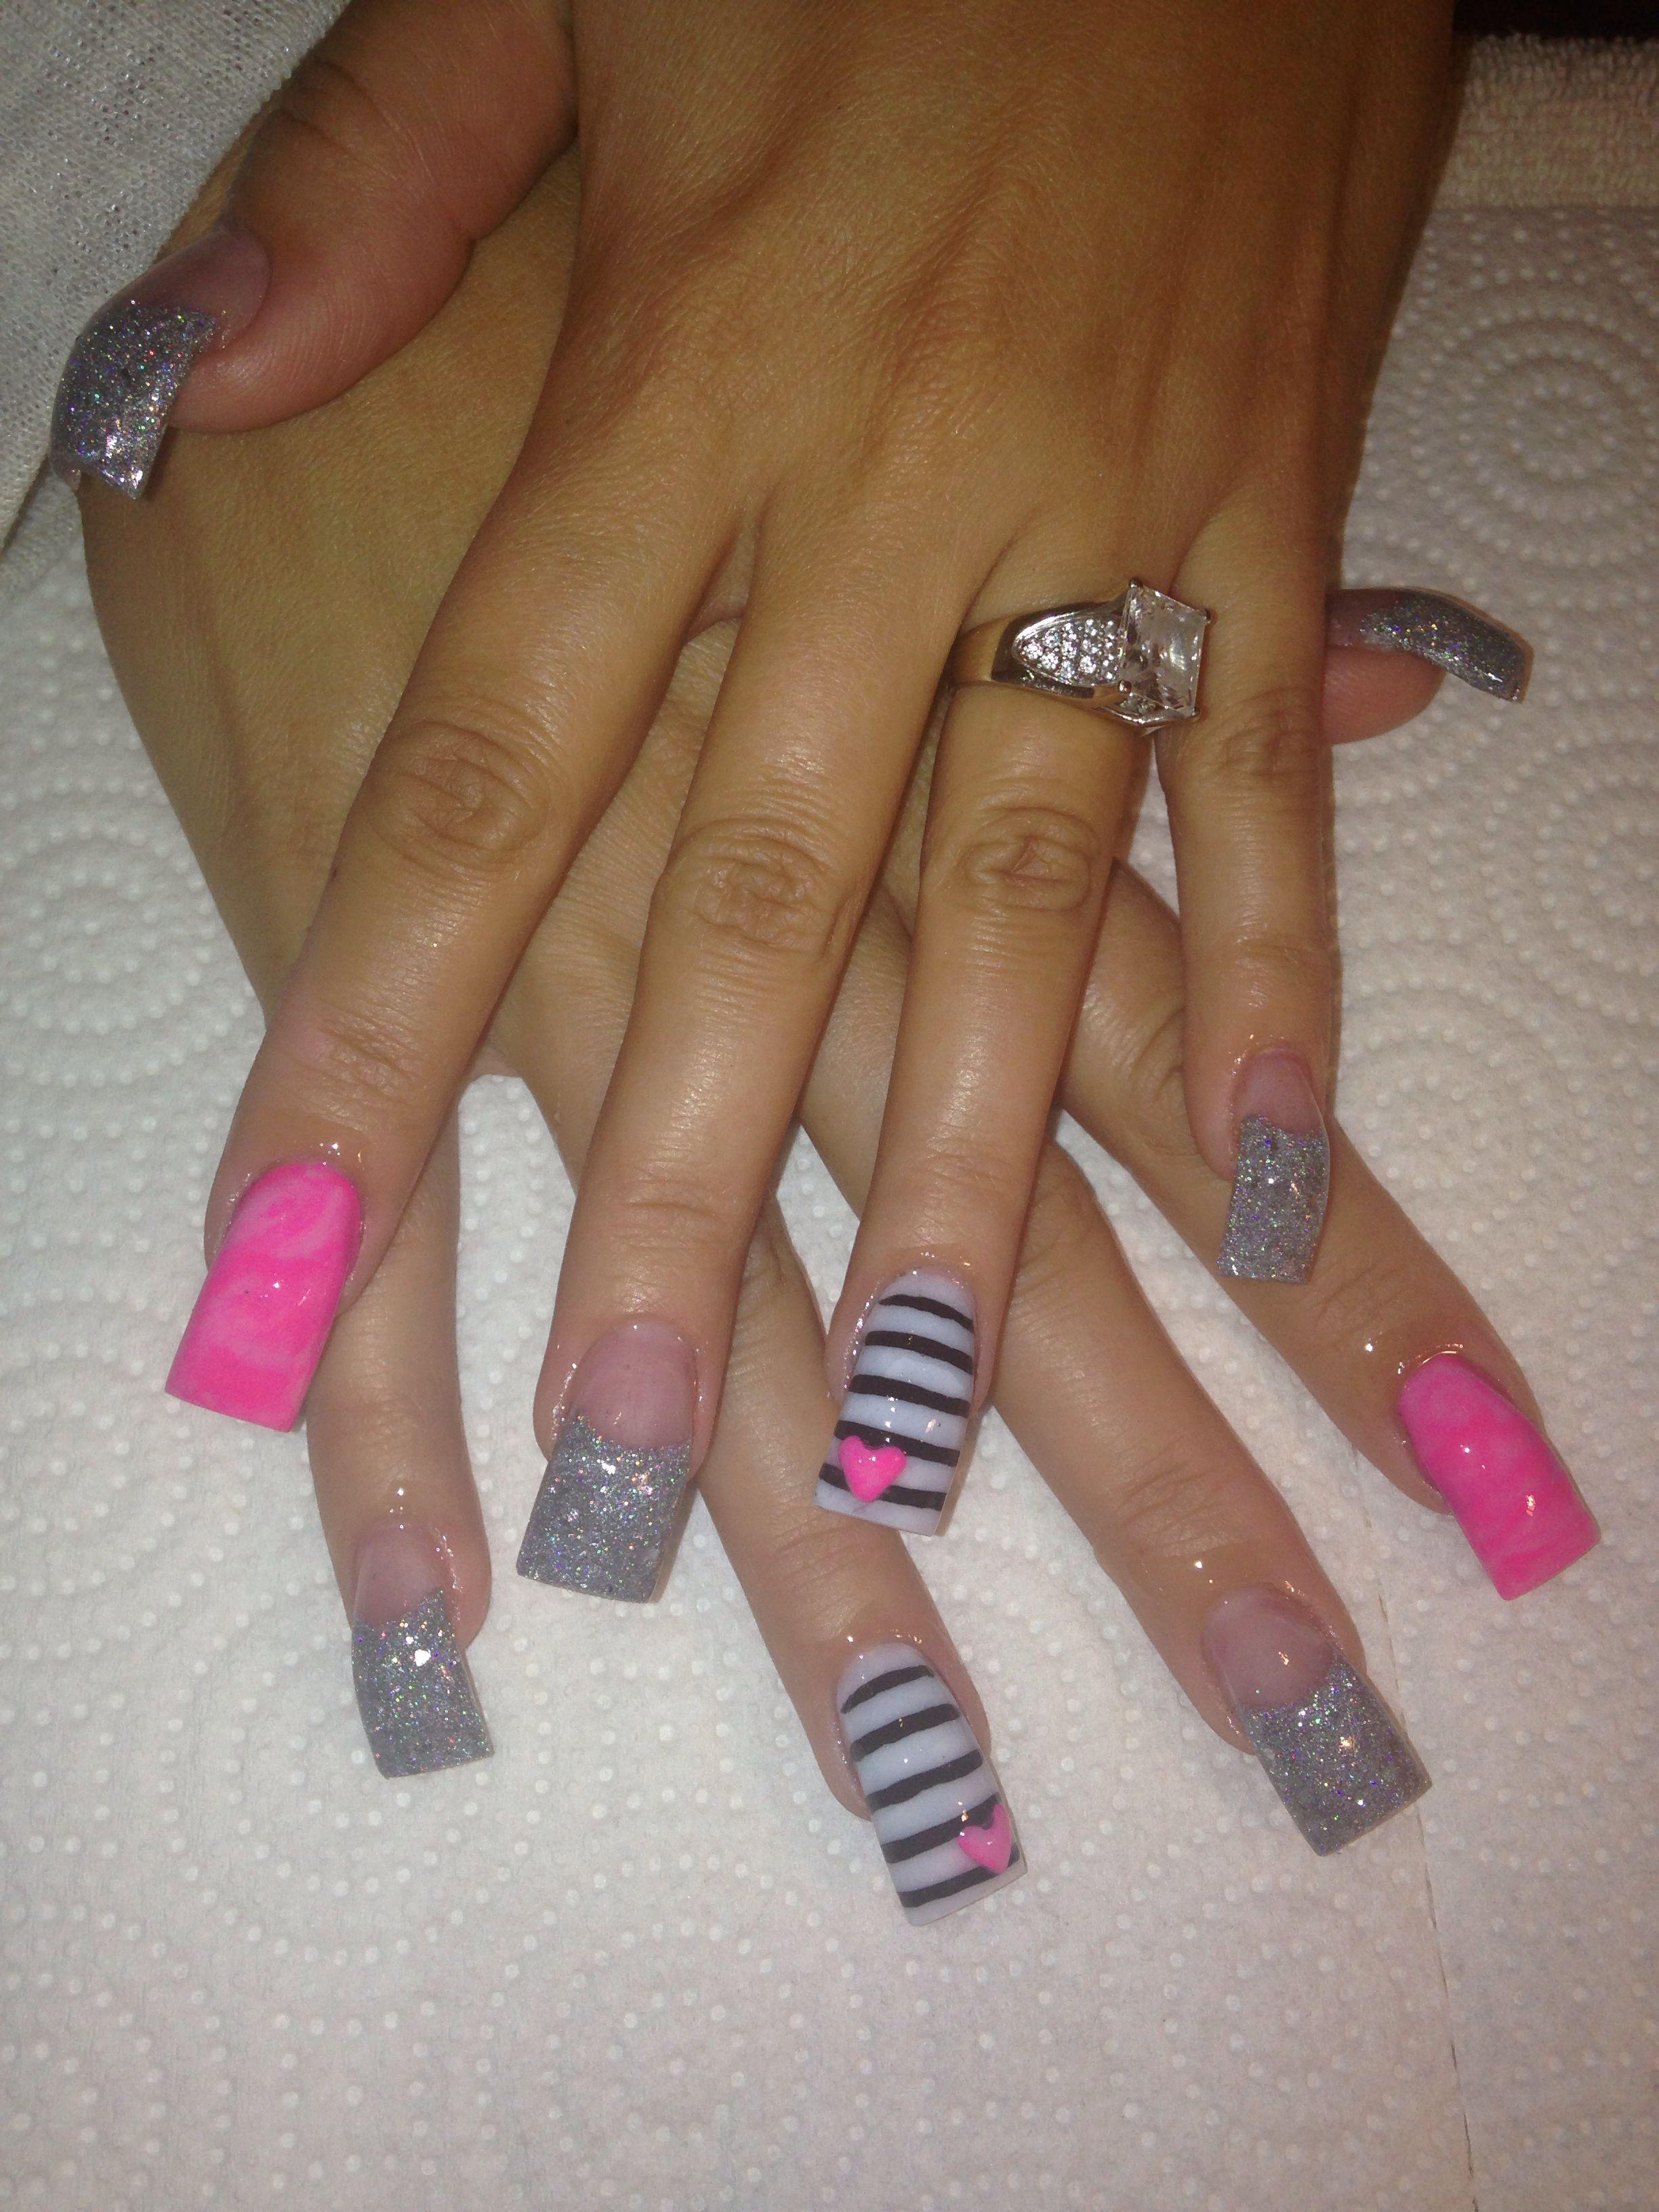 Valentines acrylic nails | Acrylic nails! | Pinterest | Acrylics ...